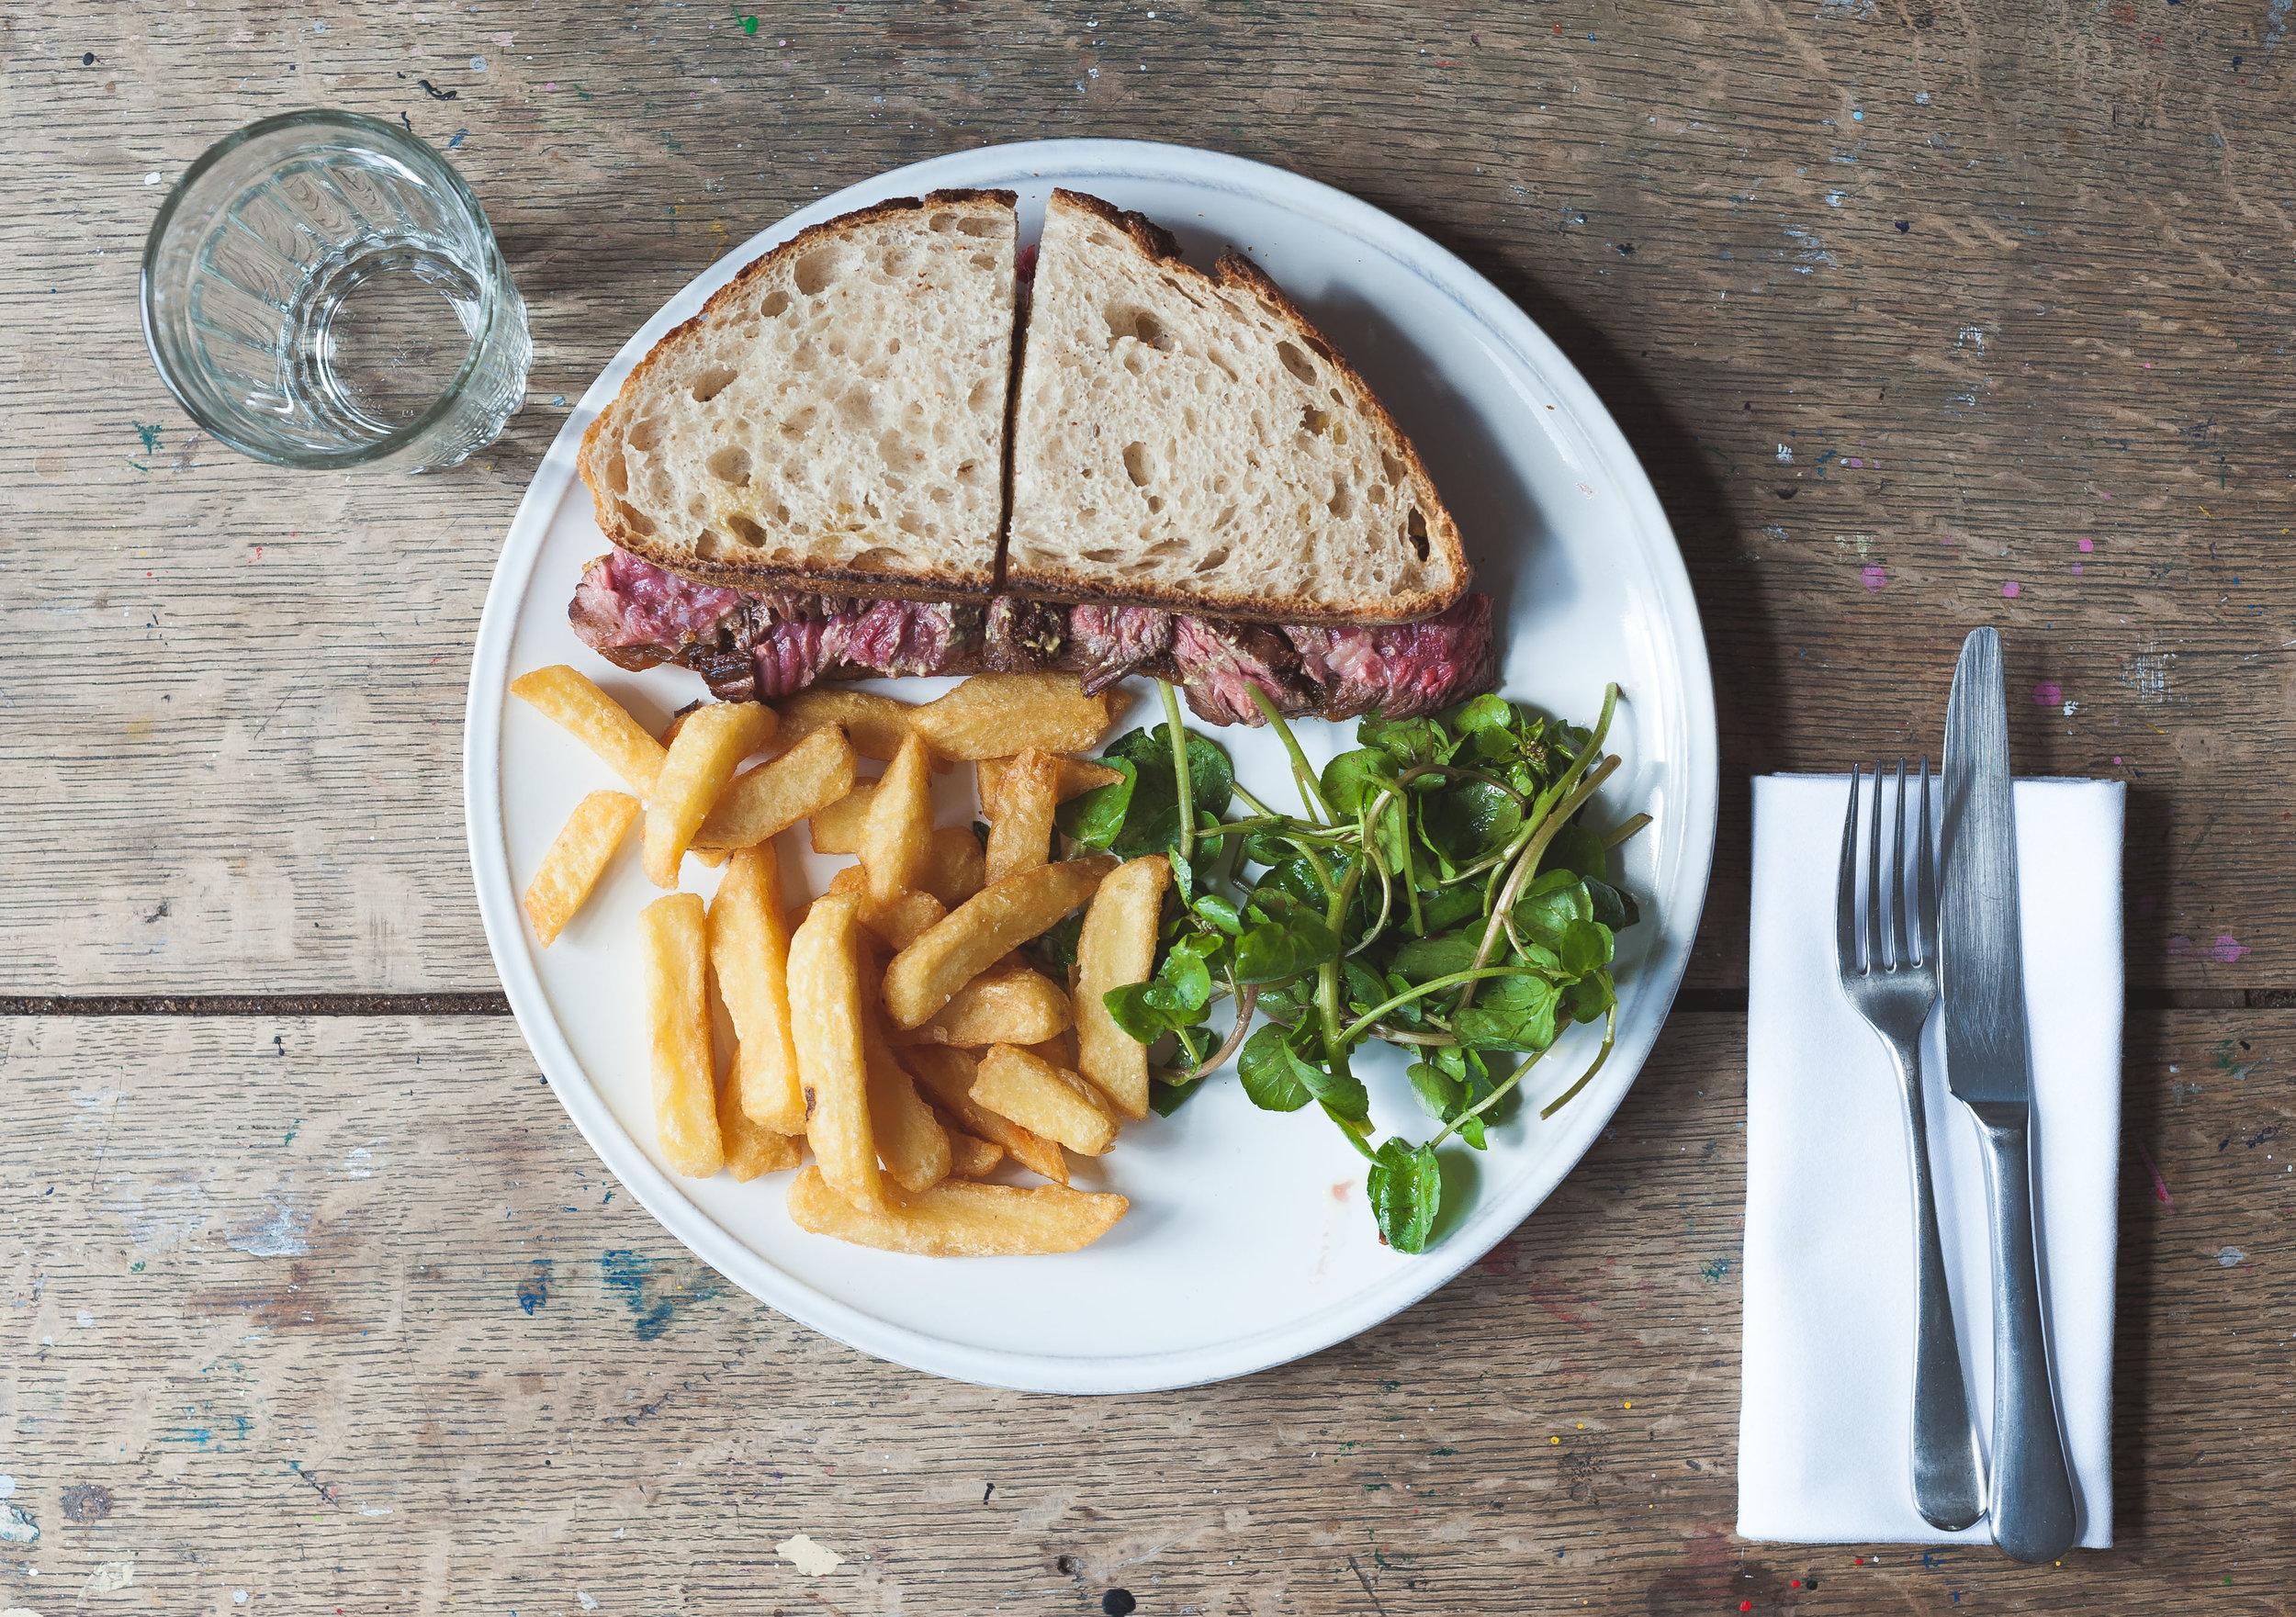 bavette-steak-sandwhich-chips-watercress-bearness-sauce.jpg